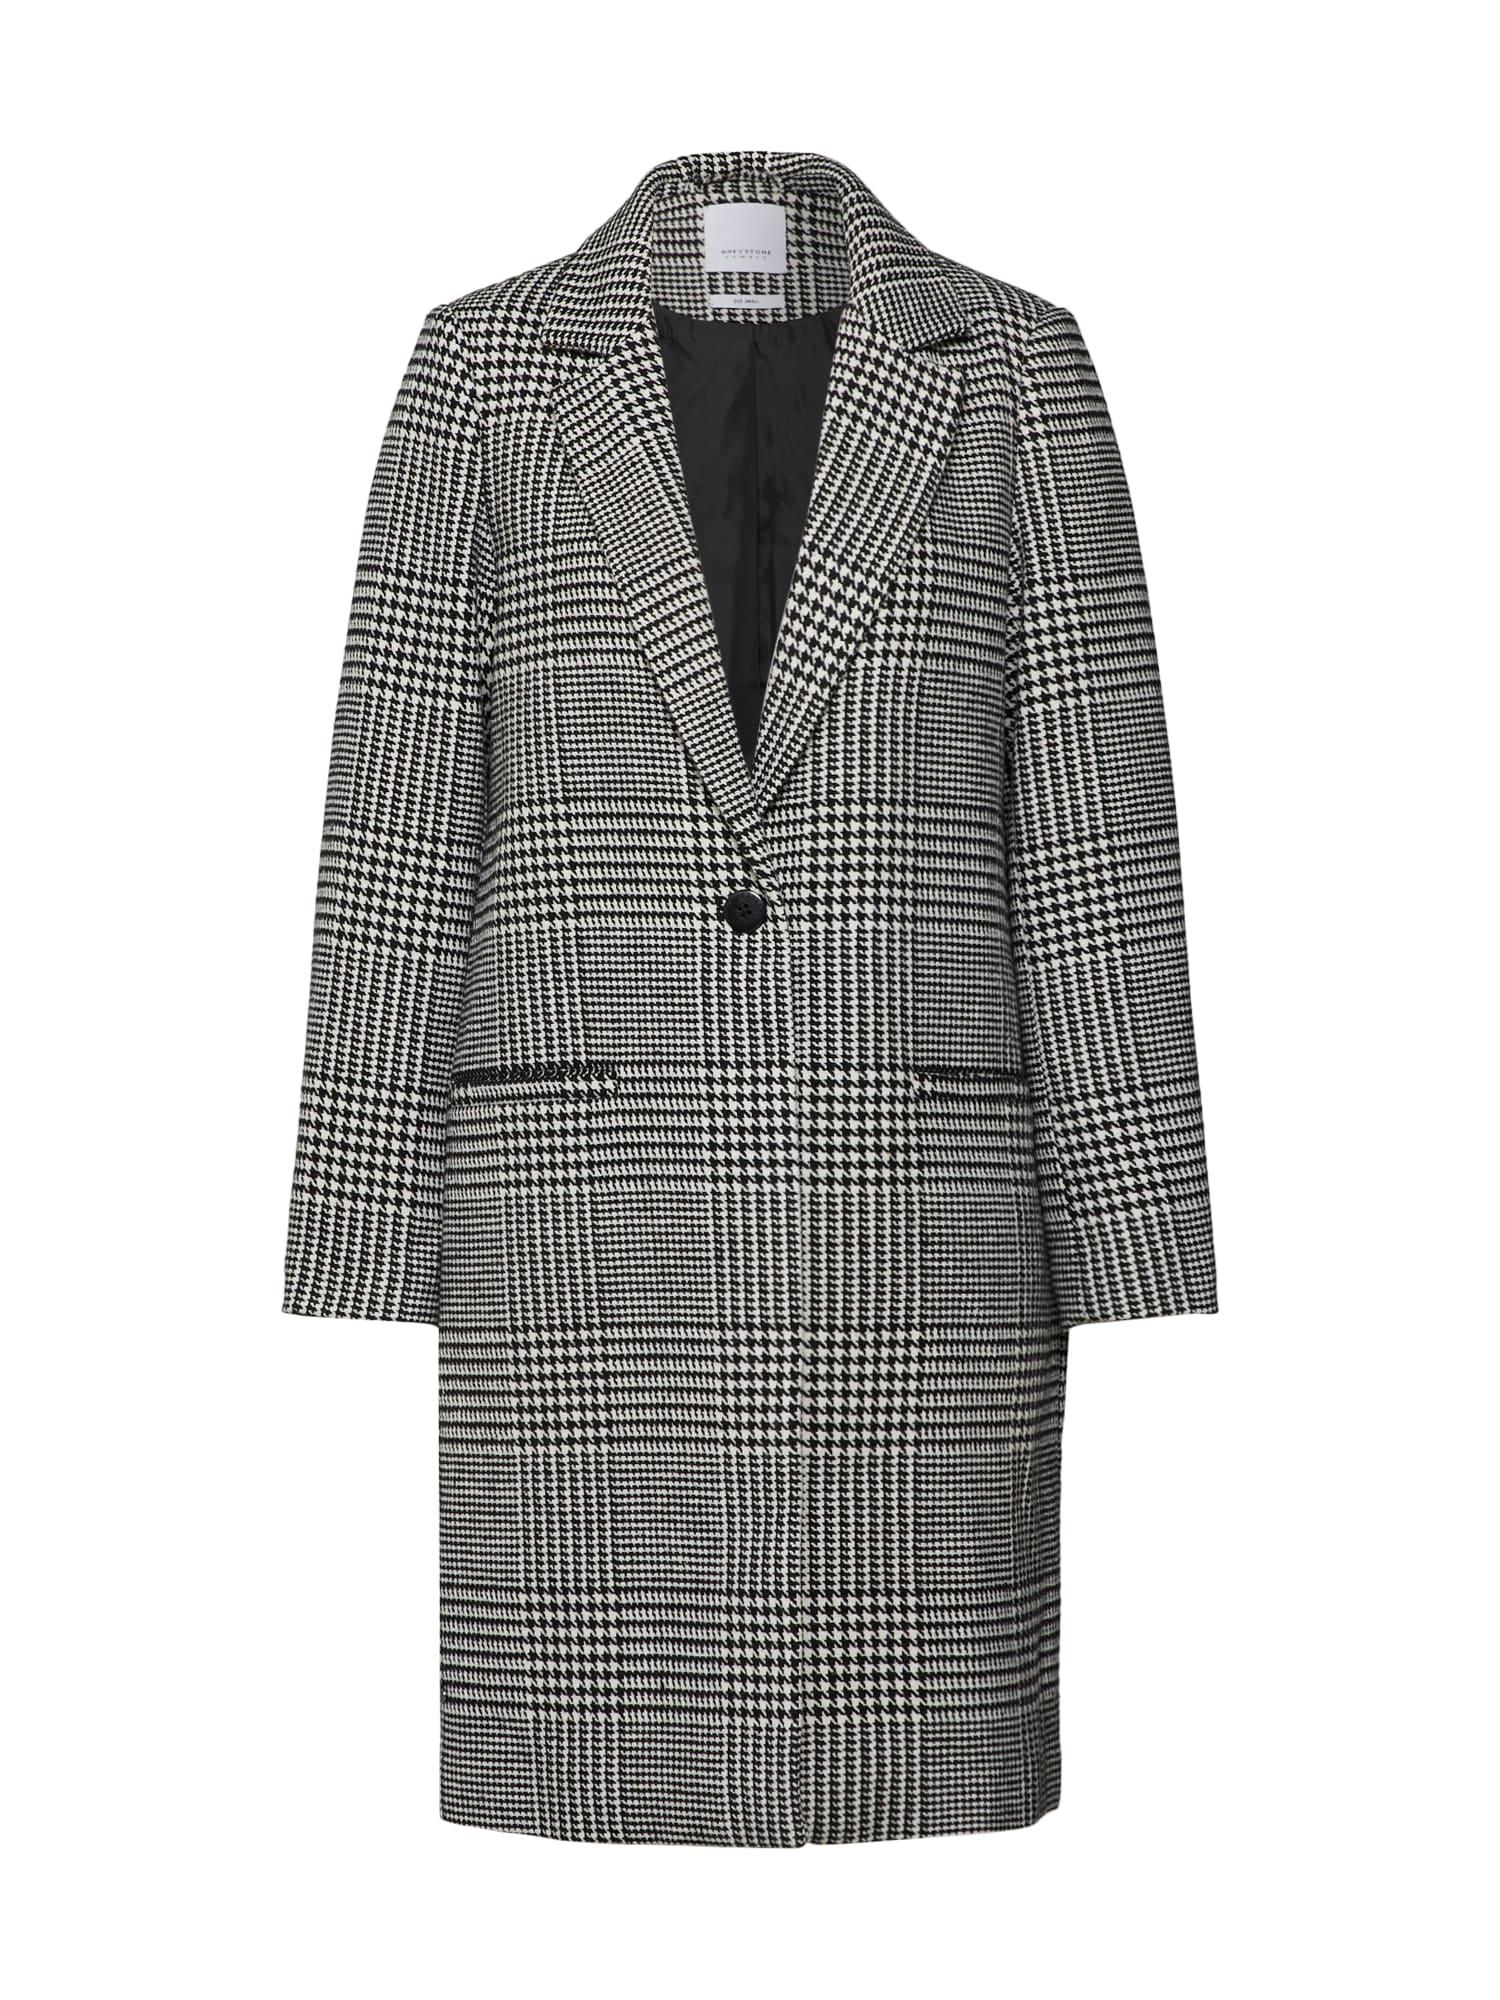 Přechodný kabát šedá bílá GREYSTONE